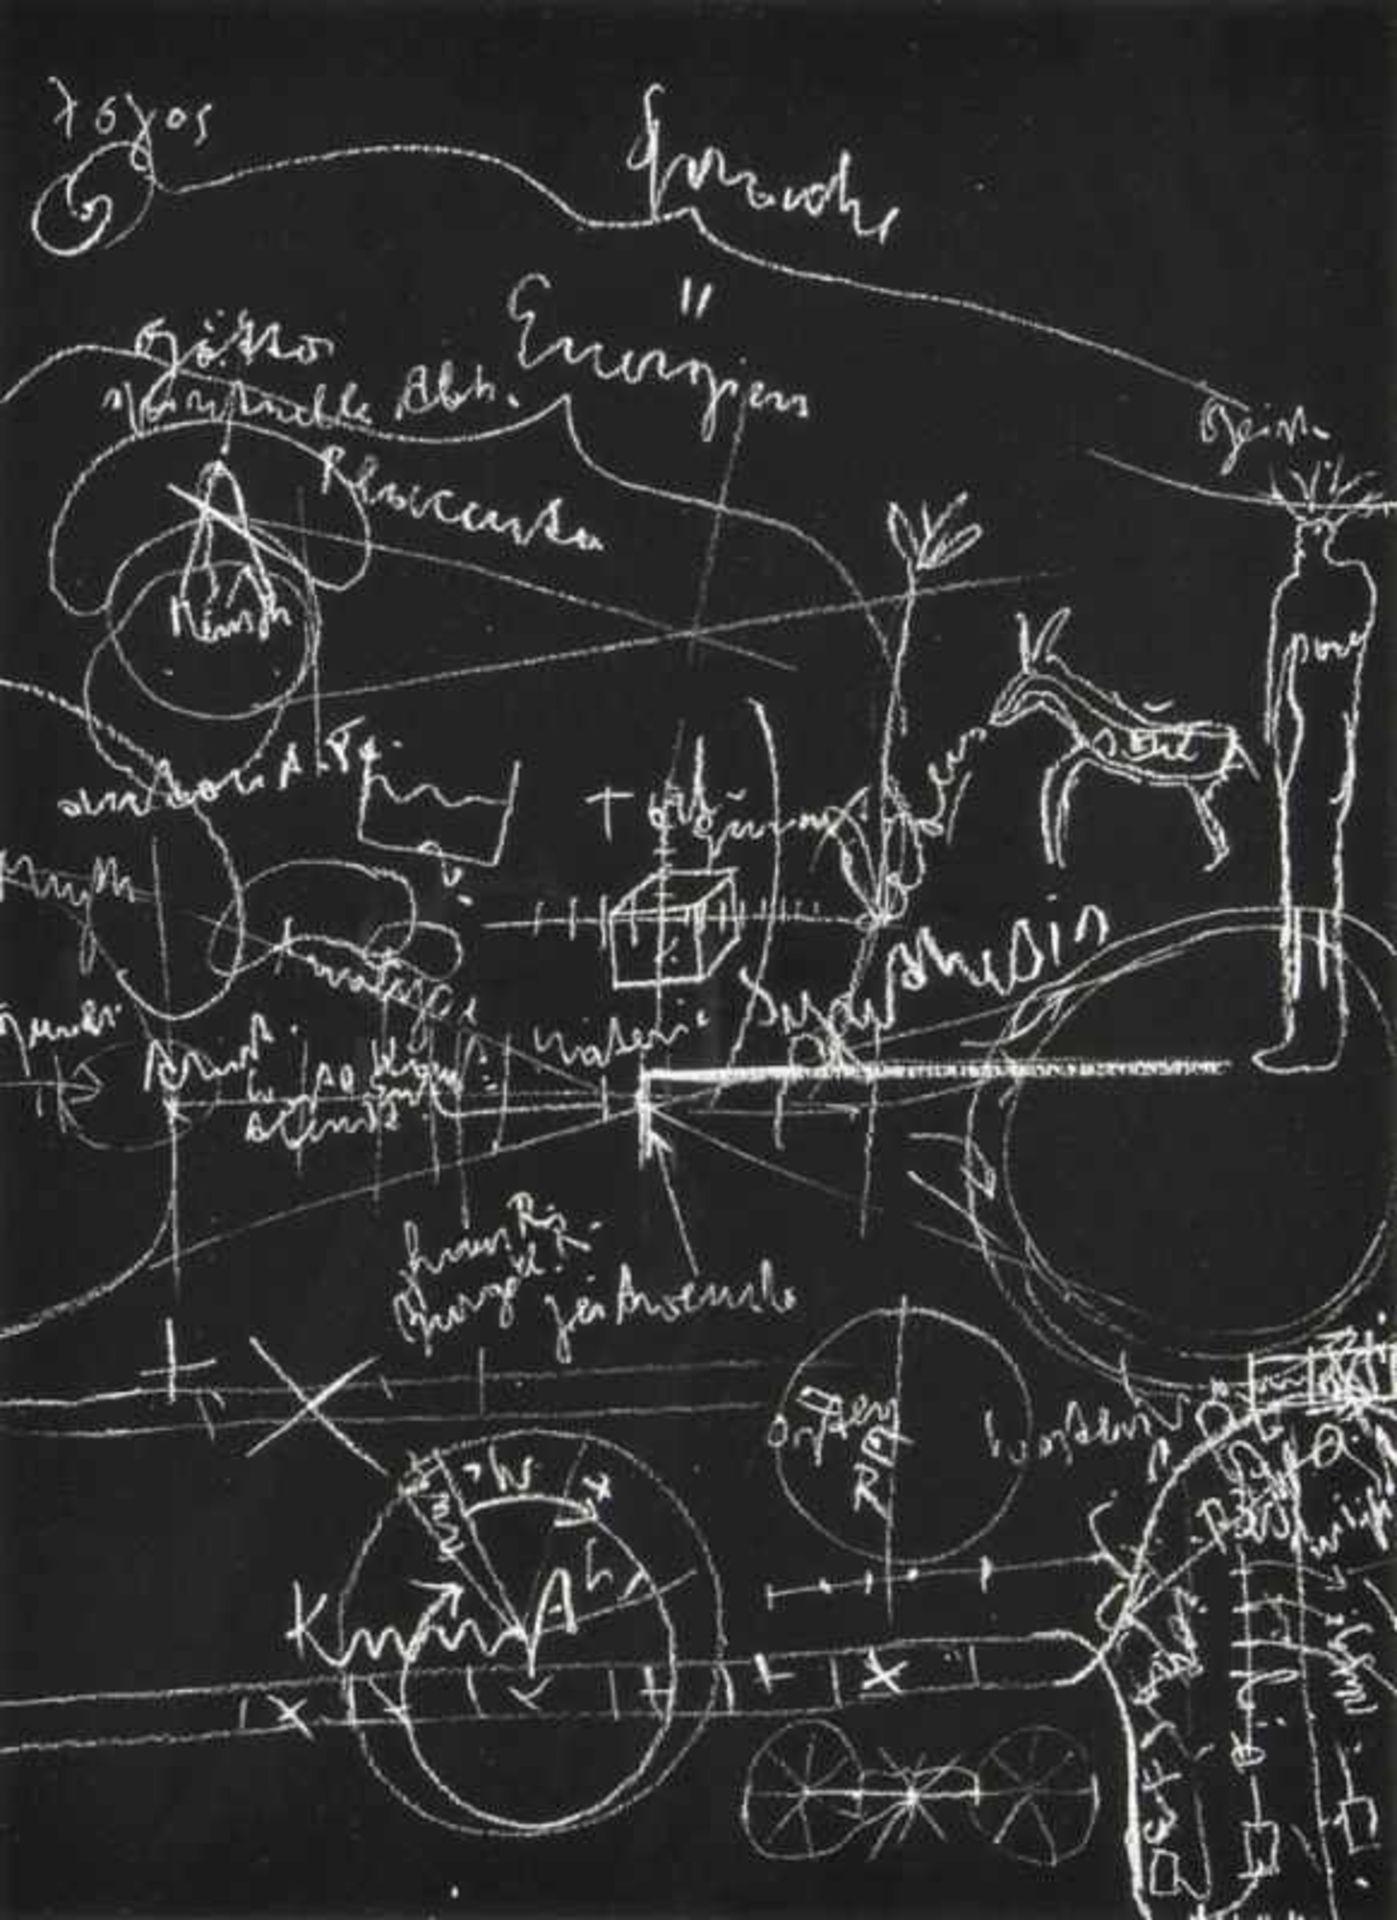 Los 7 - JOSEPH BEUYS(1921 KREFELD - 1986 DÜSSELDORF)BLACKBOARD I, II, UND III, 1980Drei Lithografien,